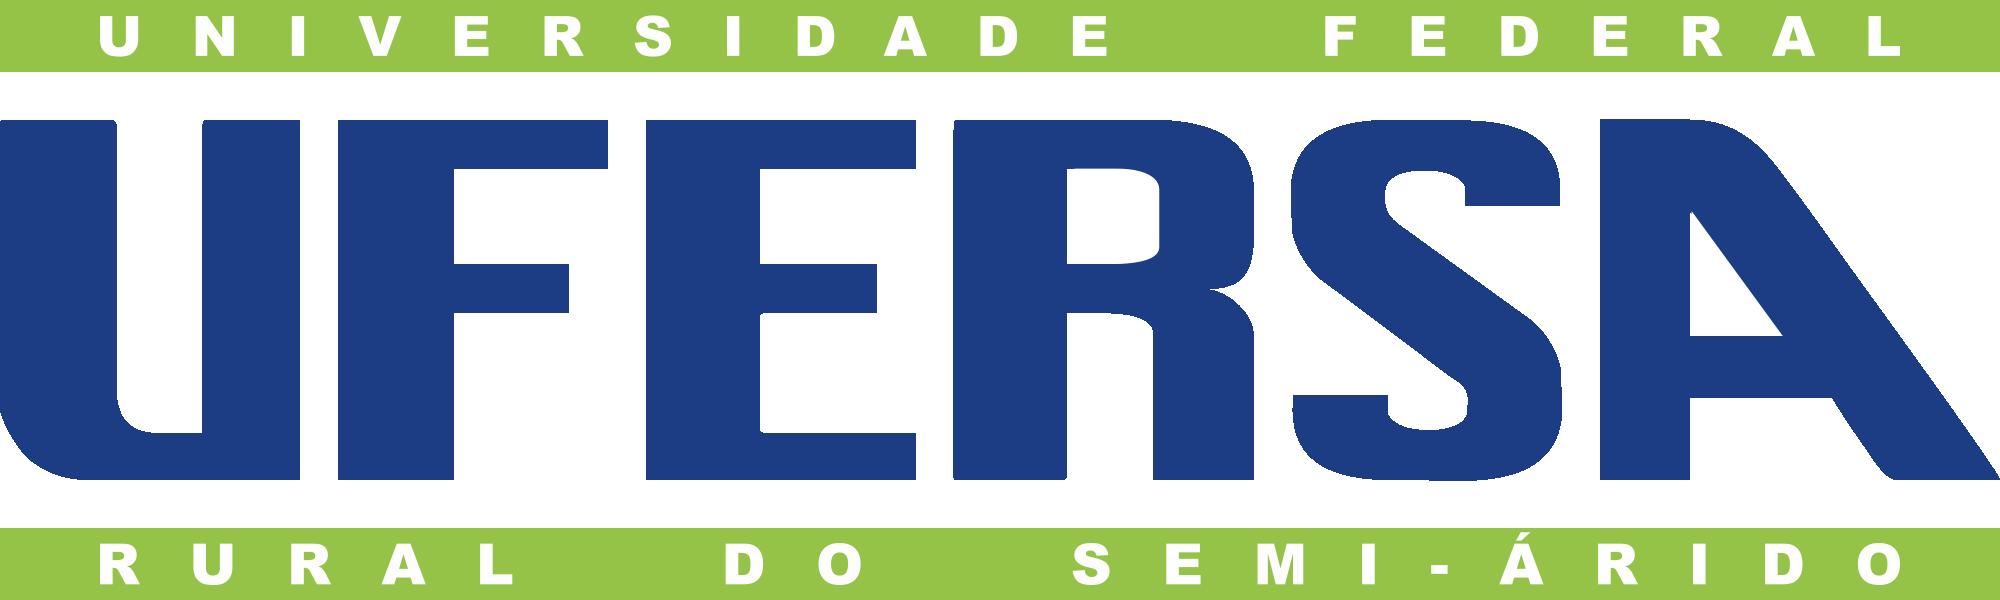 UNIVERSIDADE FEDERAL RURAL DO SEMI-ÁRIDO